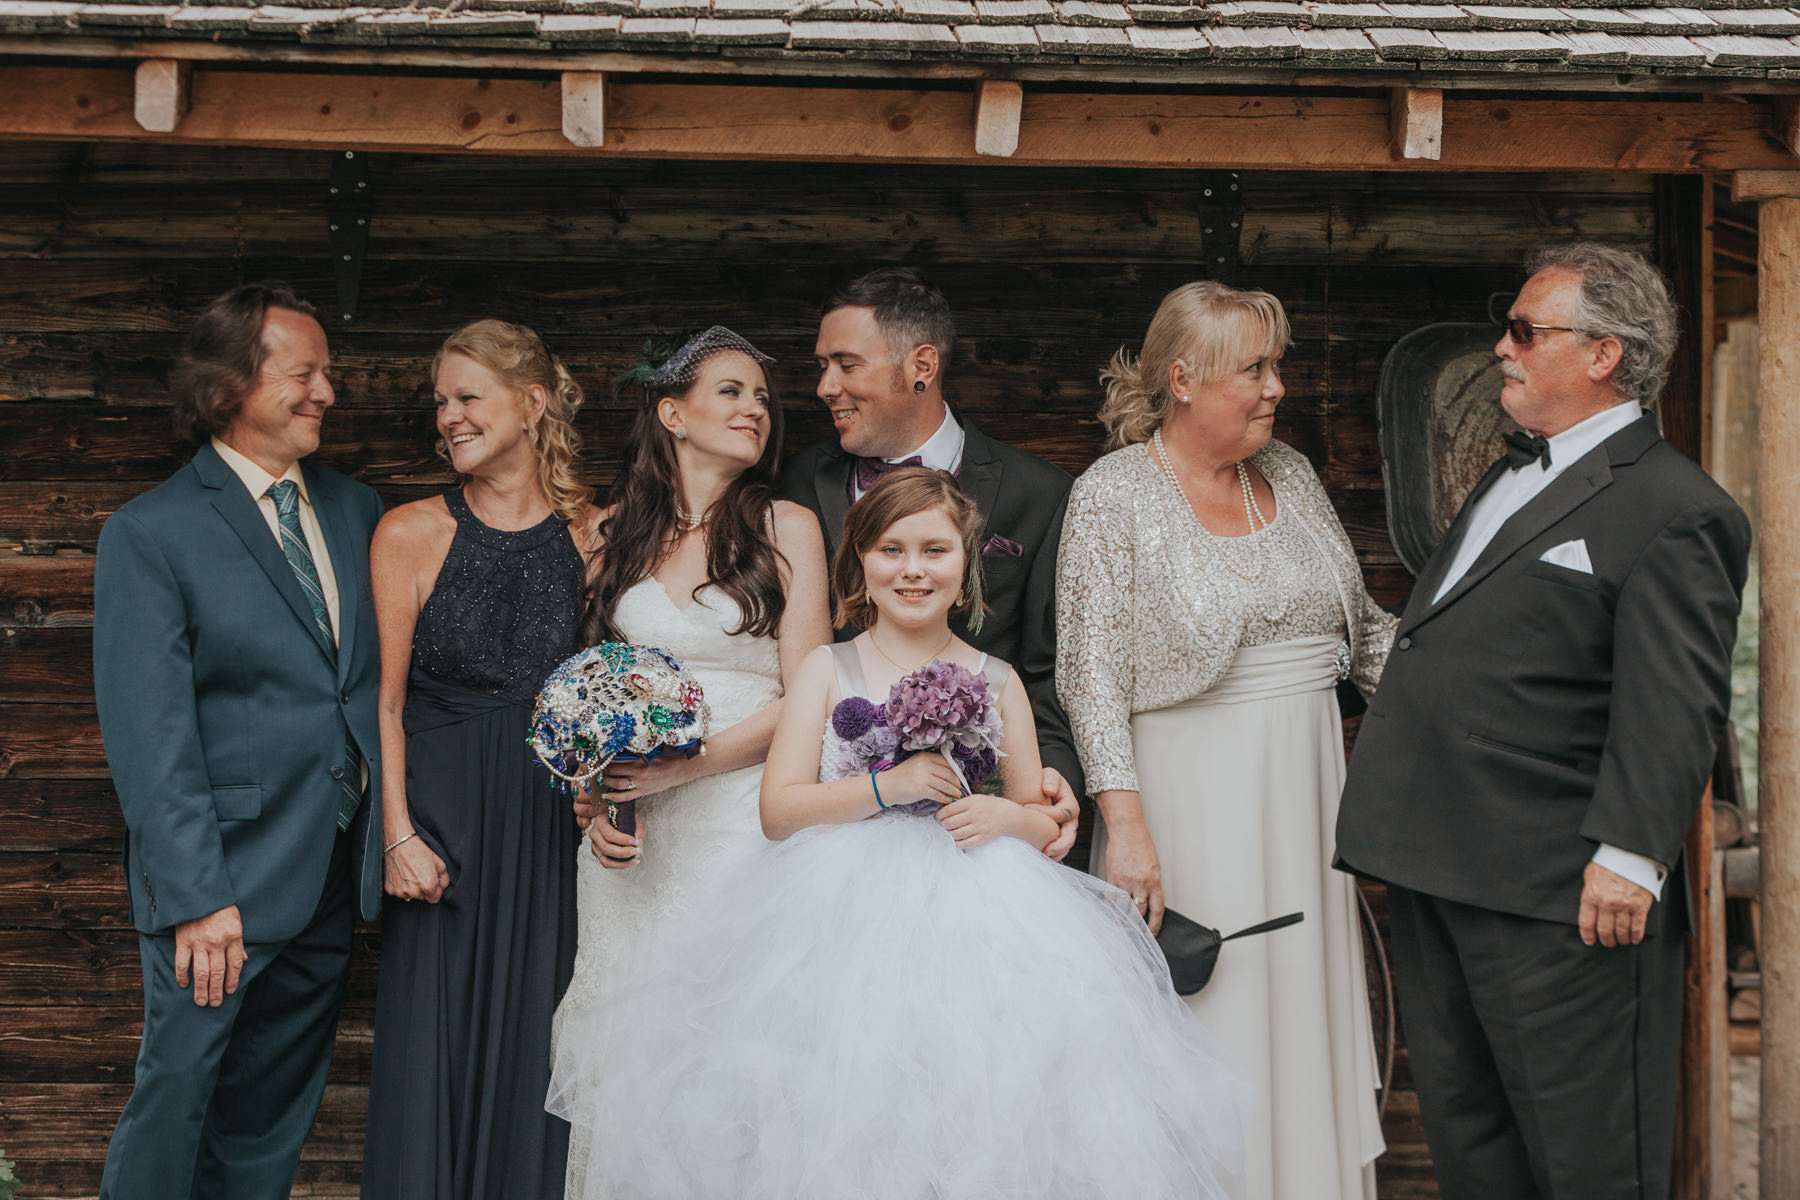 Vancouver Wedding Photographer Pam (45).jpg